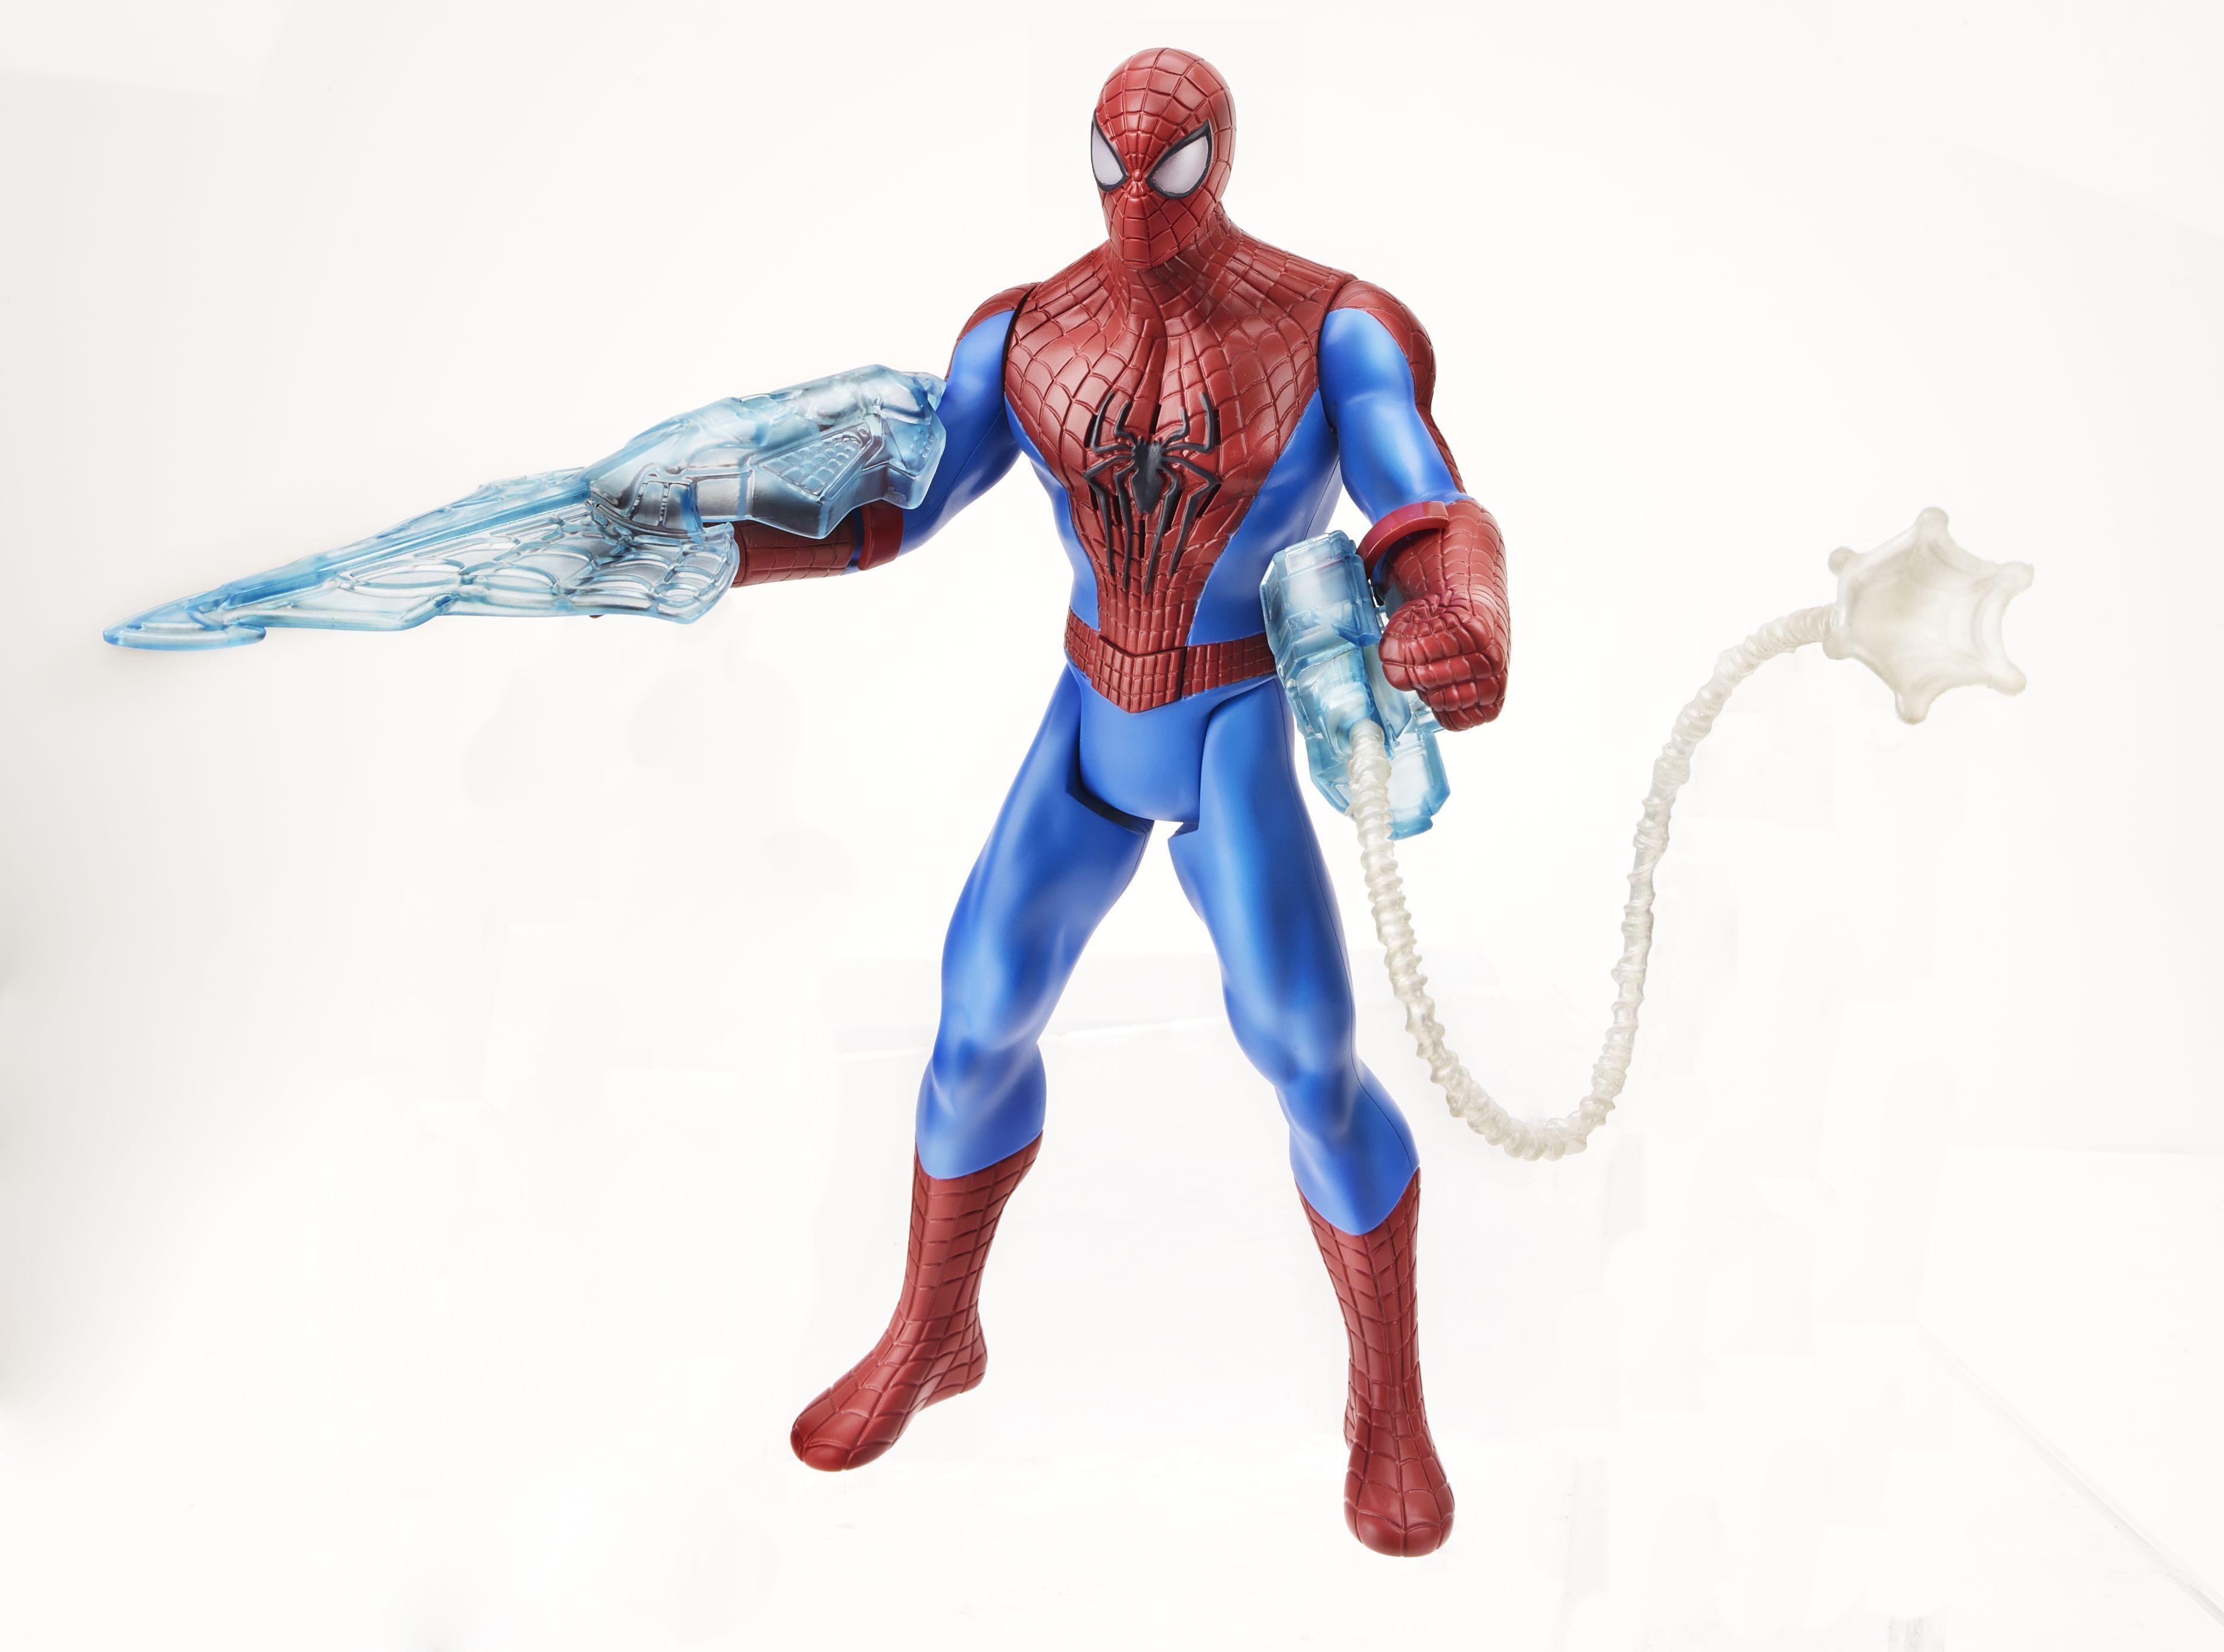 человек паук картинки игрушки человек паук единственная деревня, уничтожении